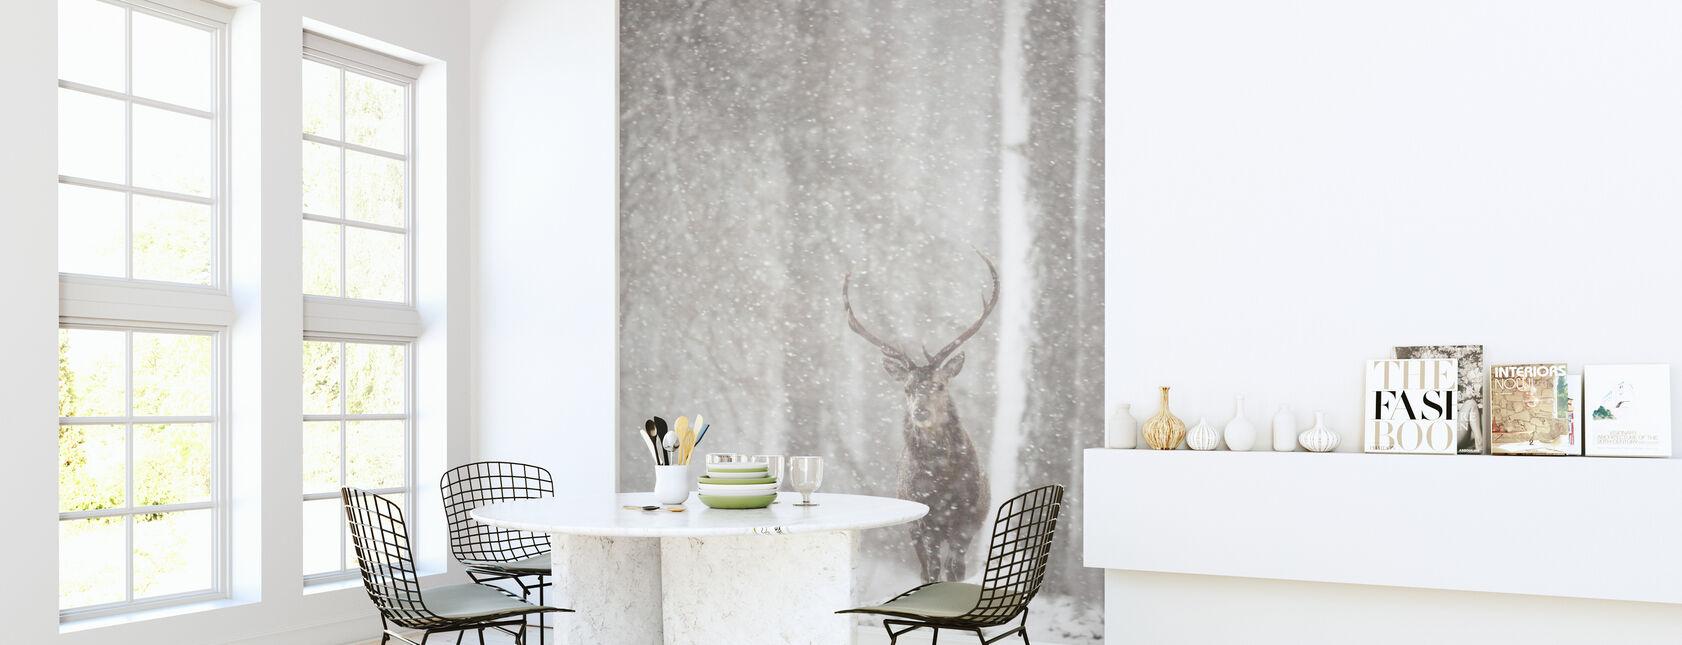 Red Deer in Heavy Snowfall - Wallpaper - Kitchen